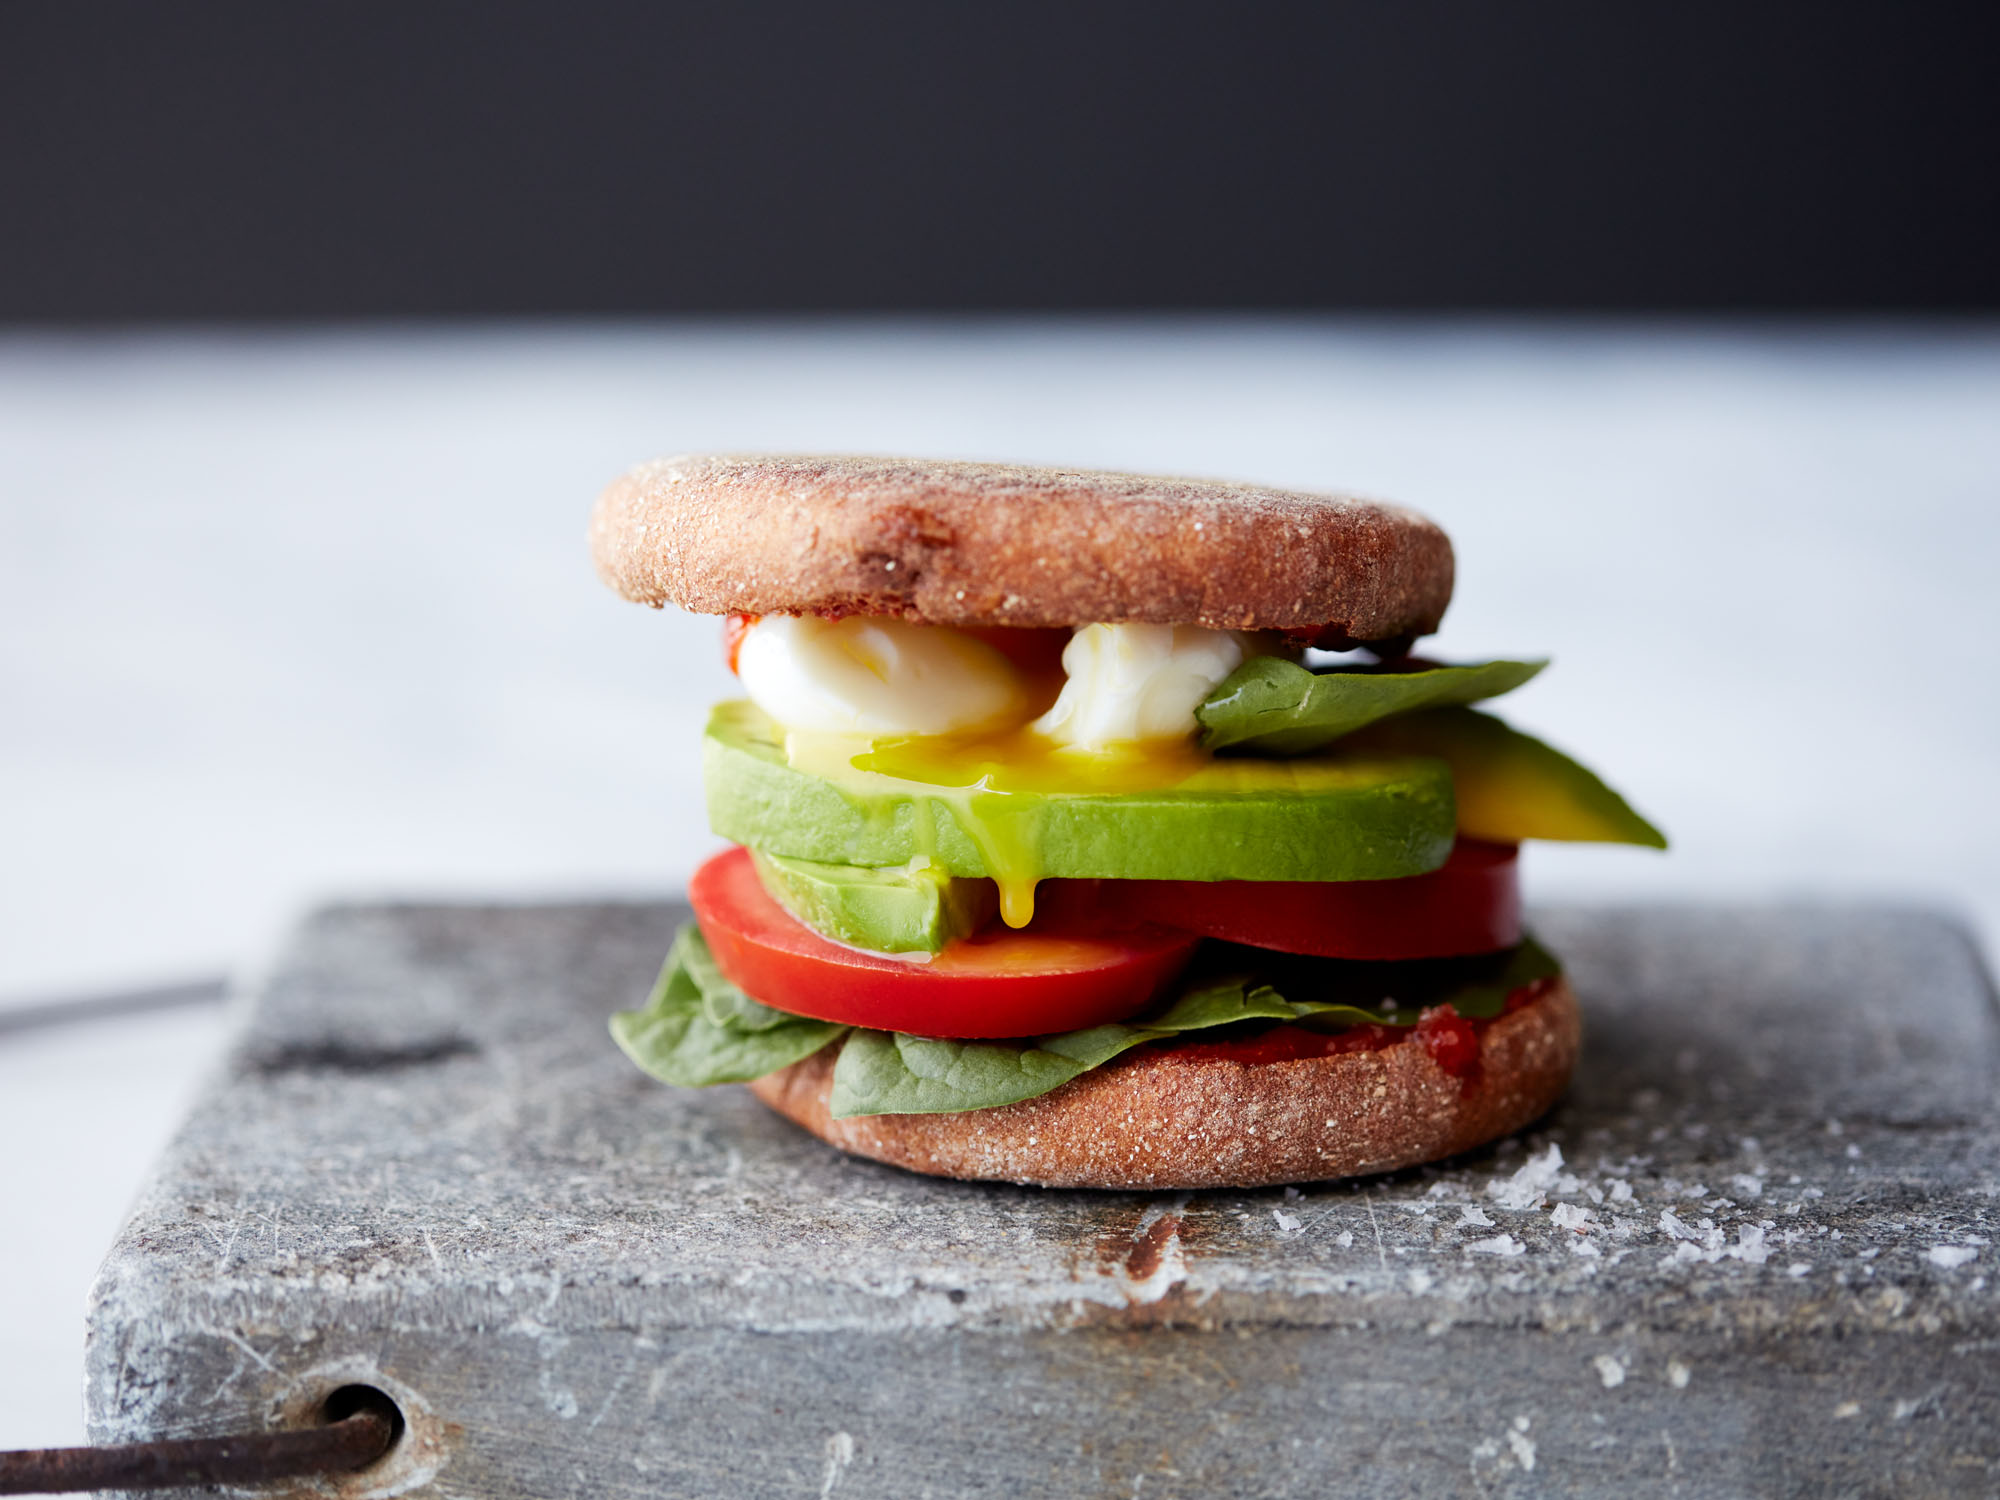 20160719_DrJulia_Poached-Egg-Sandwich006.jpg